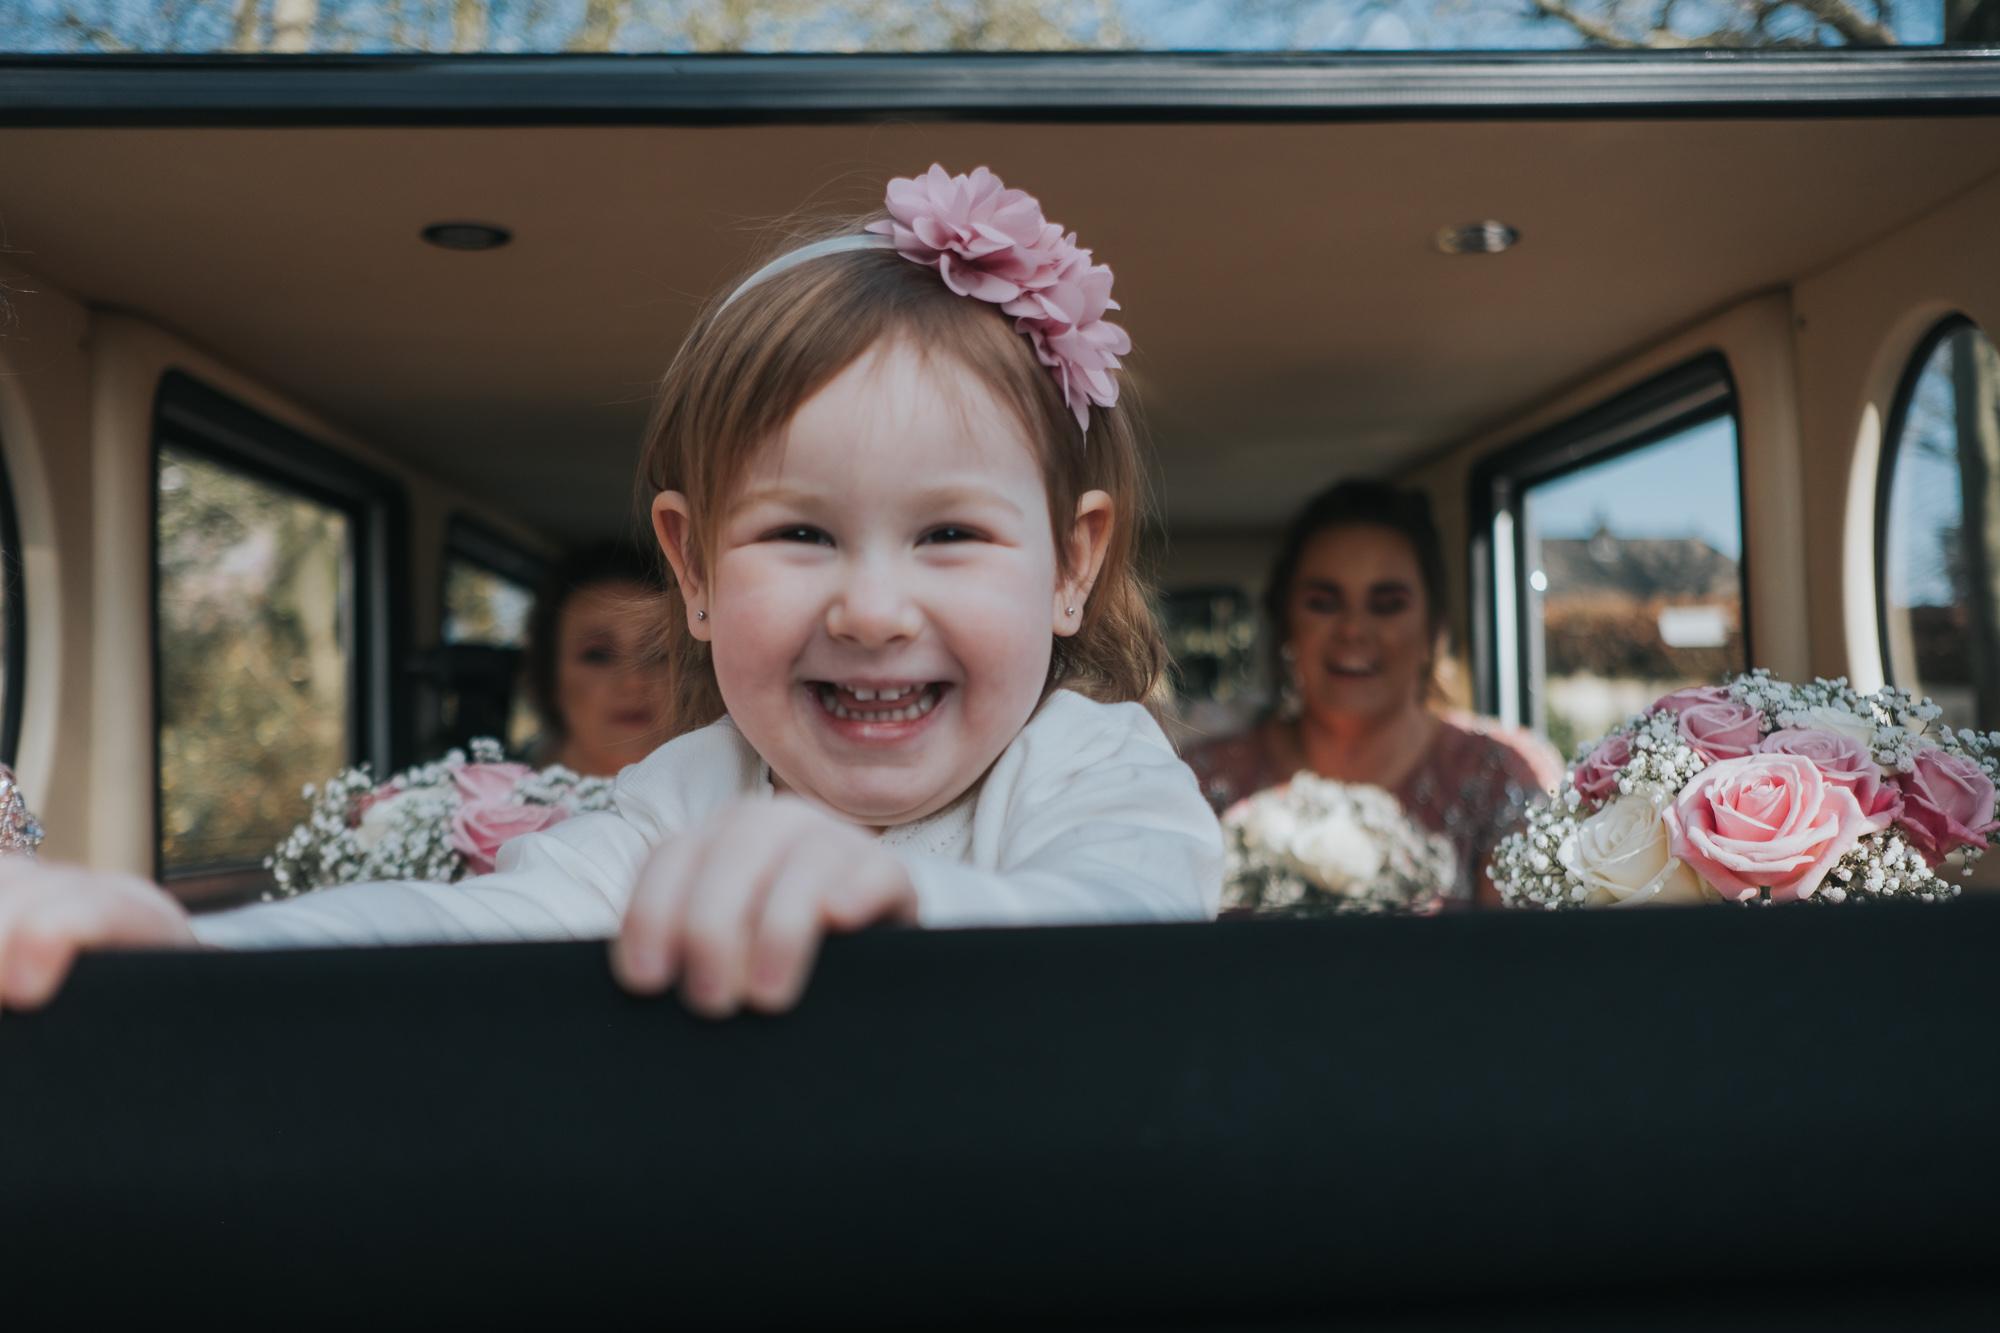 West Tower Exclusive Wedding Venue wedding photography merseyside and lancashire wedding photographer (18 of 60).jpg